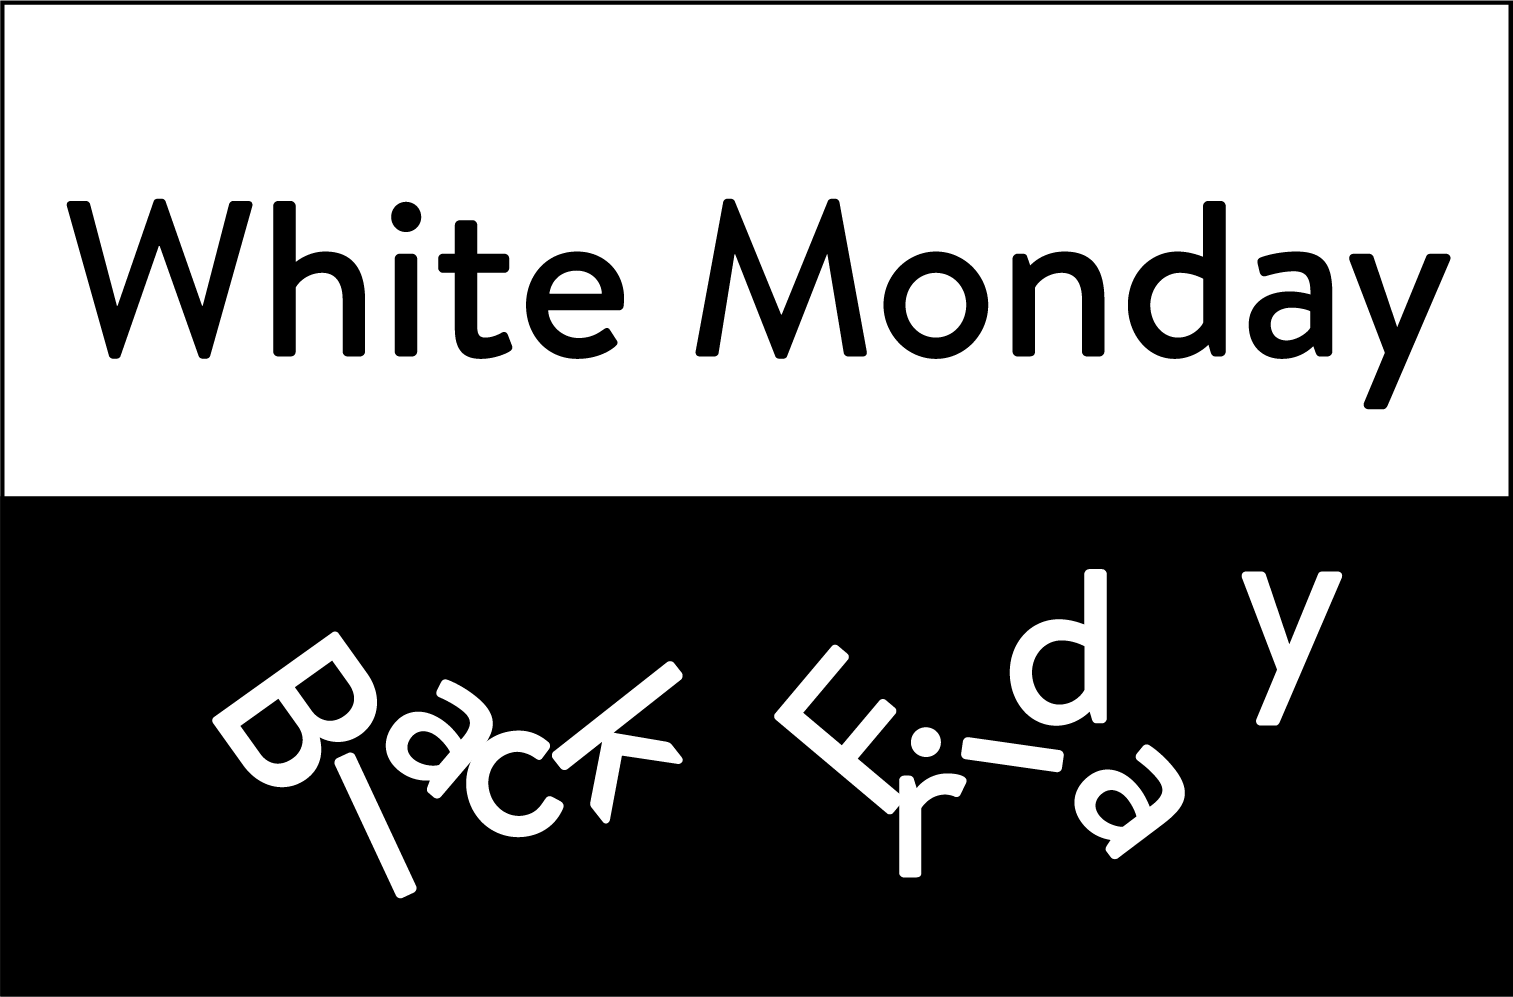 6241 White Monday Black Friday